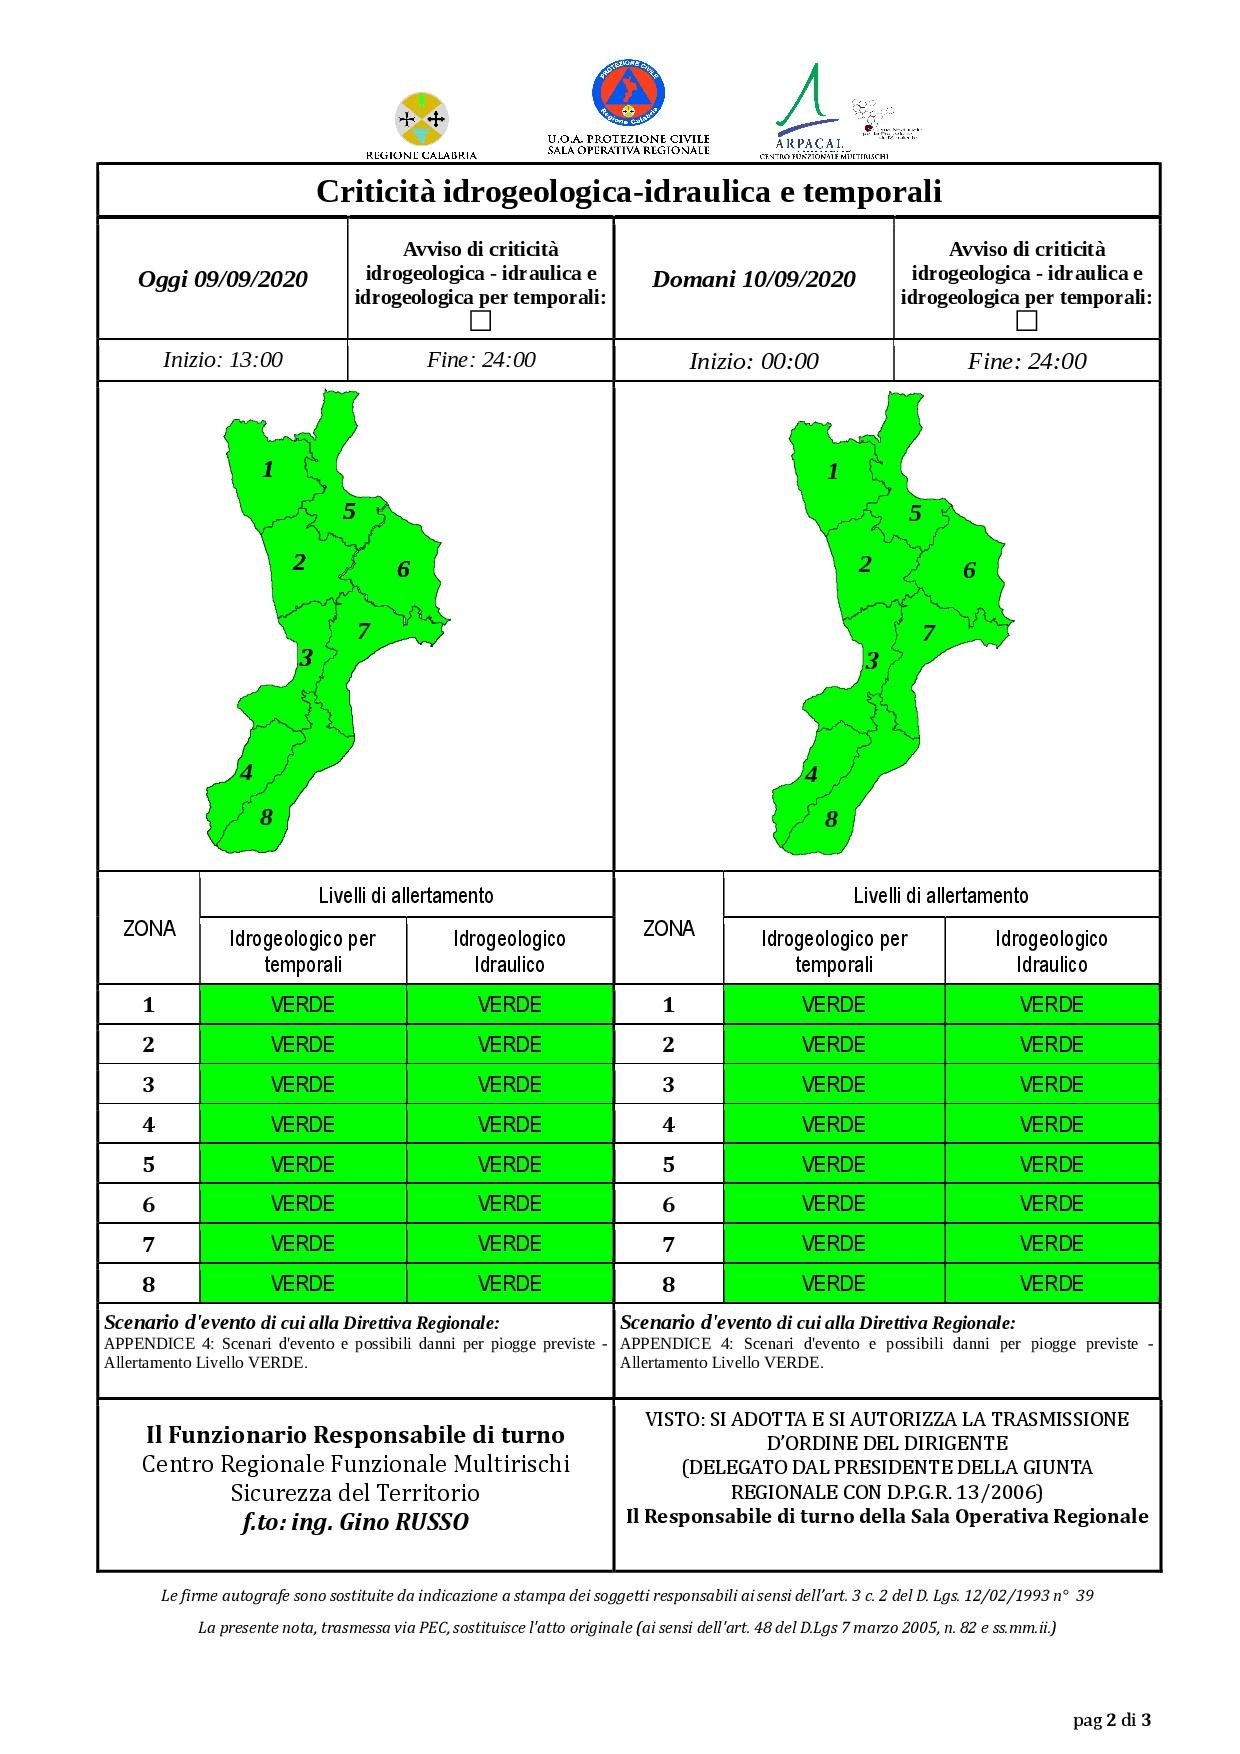 Criticità idrogeologica-idraulica e temporali in Calabria 09-09-2020